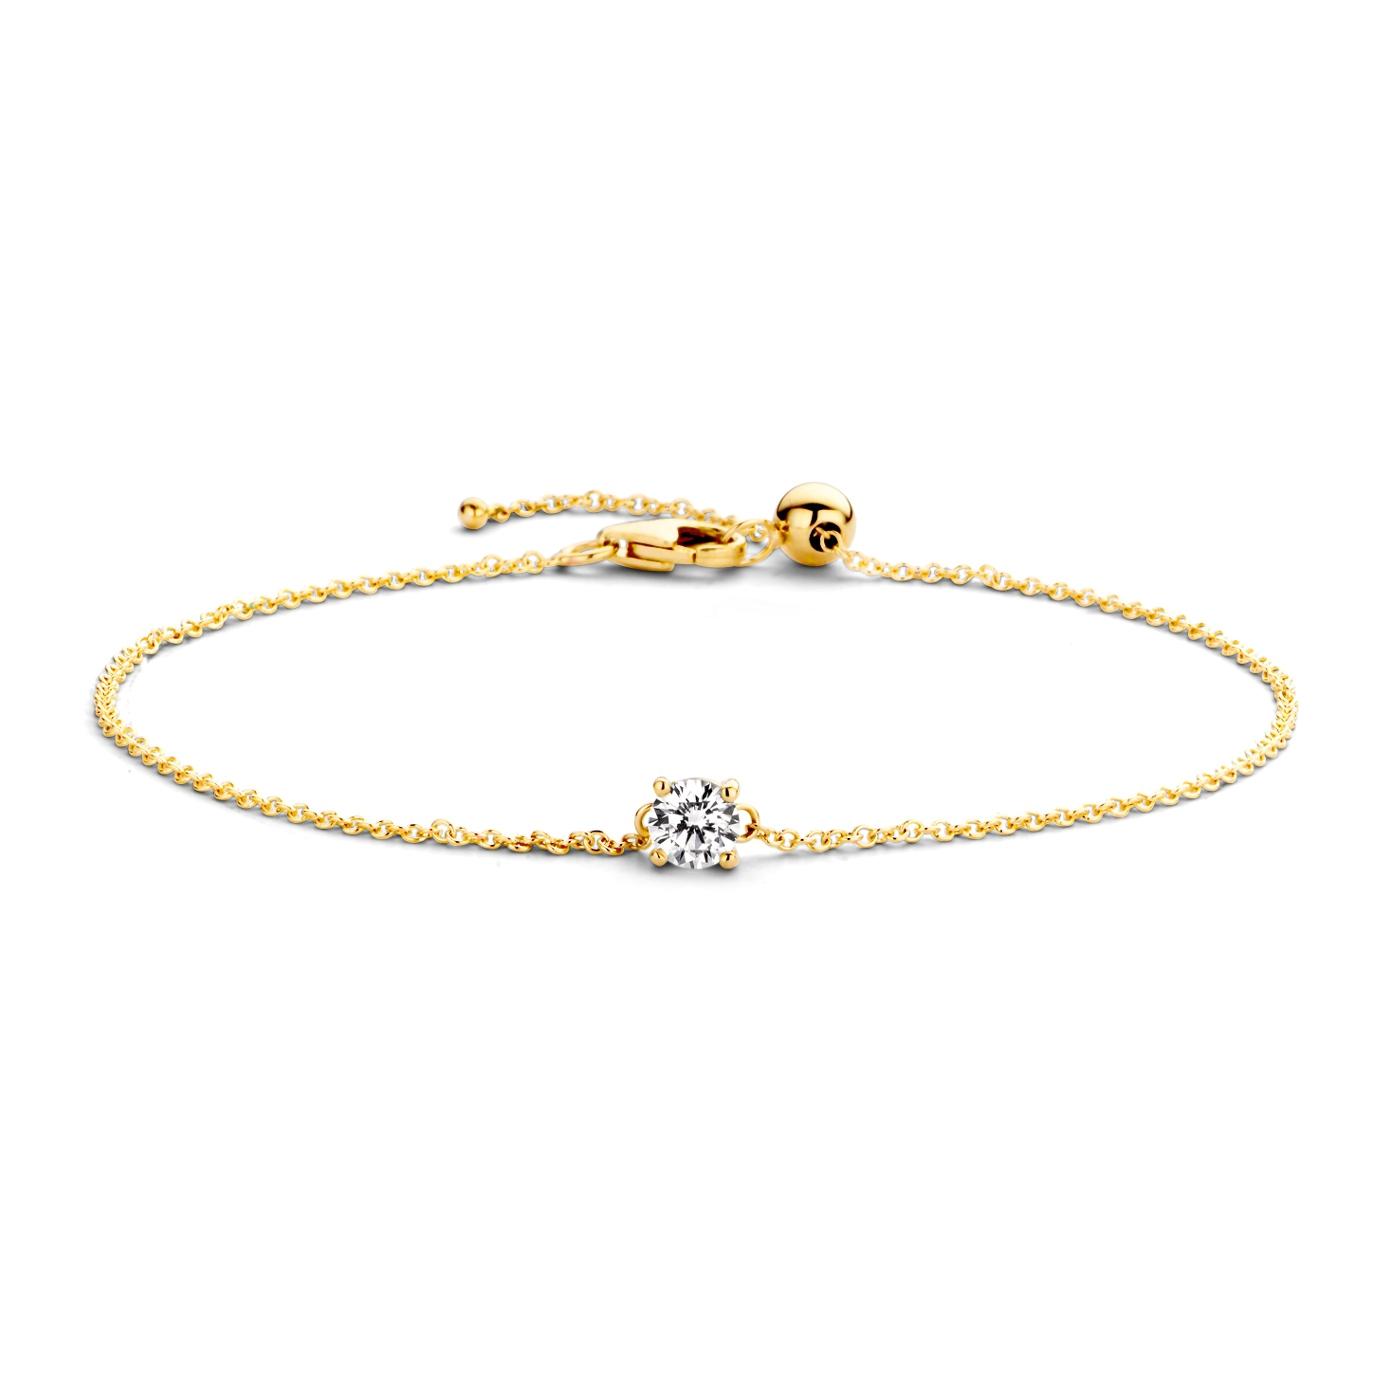 Bilde av Blush bracelet 2166YZI (Size: 18 cm)